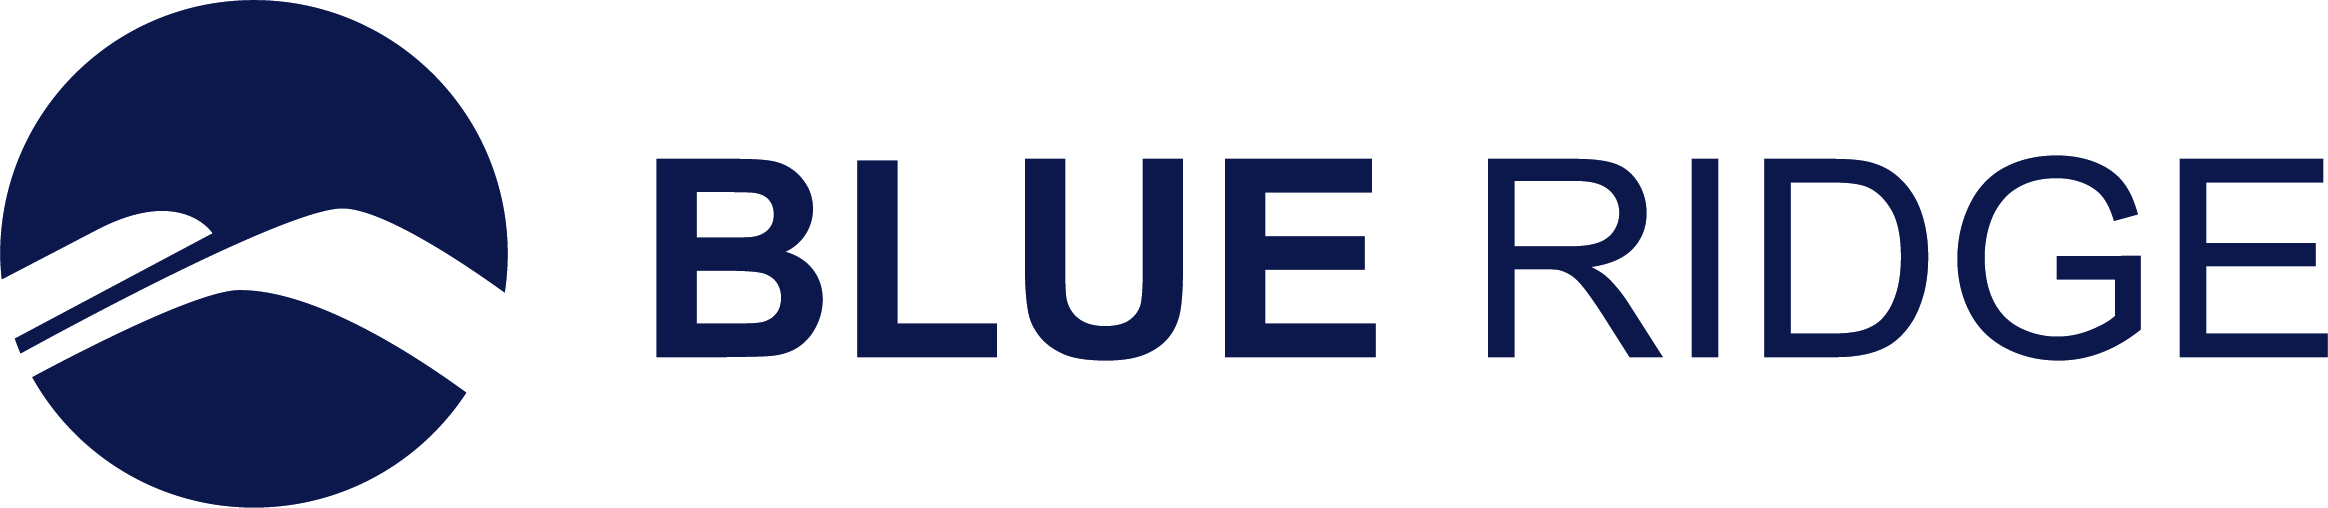 Maarten Baltussen of Blue Ridge Explores the Science Behind Inventory Planning in the European Food Industry in LogisticsMatter Magazine